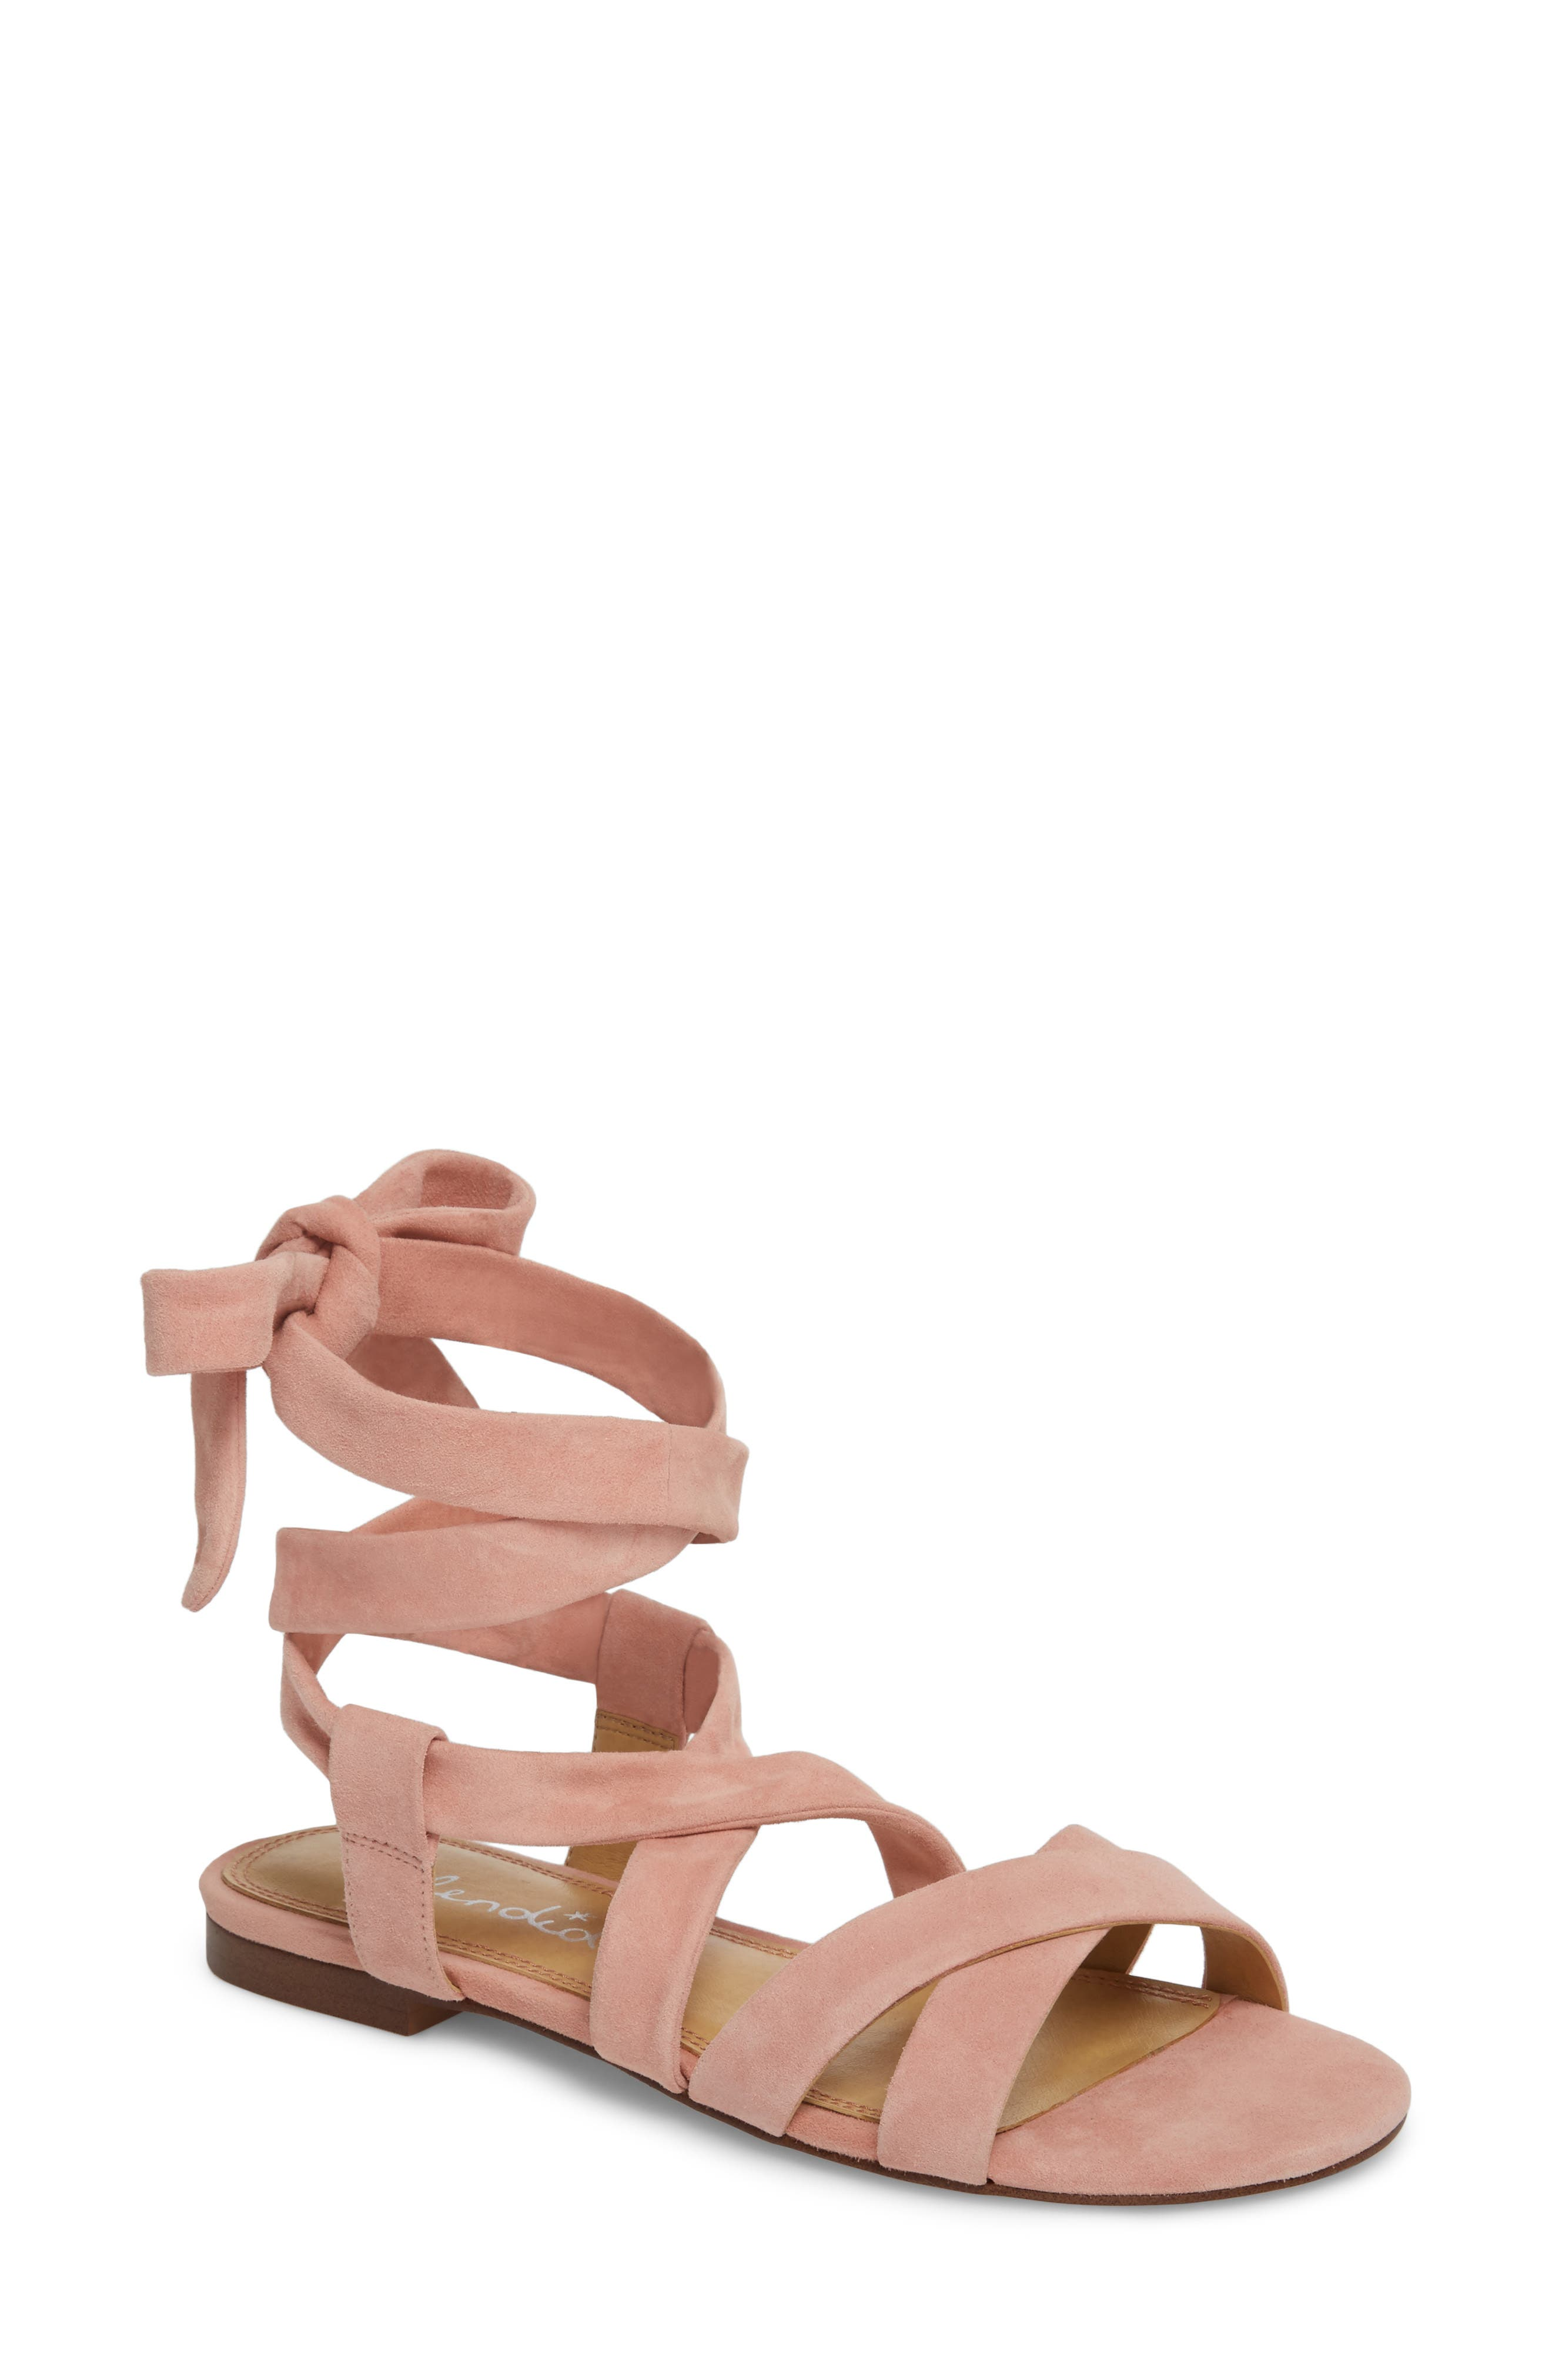 Splendid Feodora Ankle Wrap Sandal- Pink